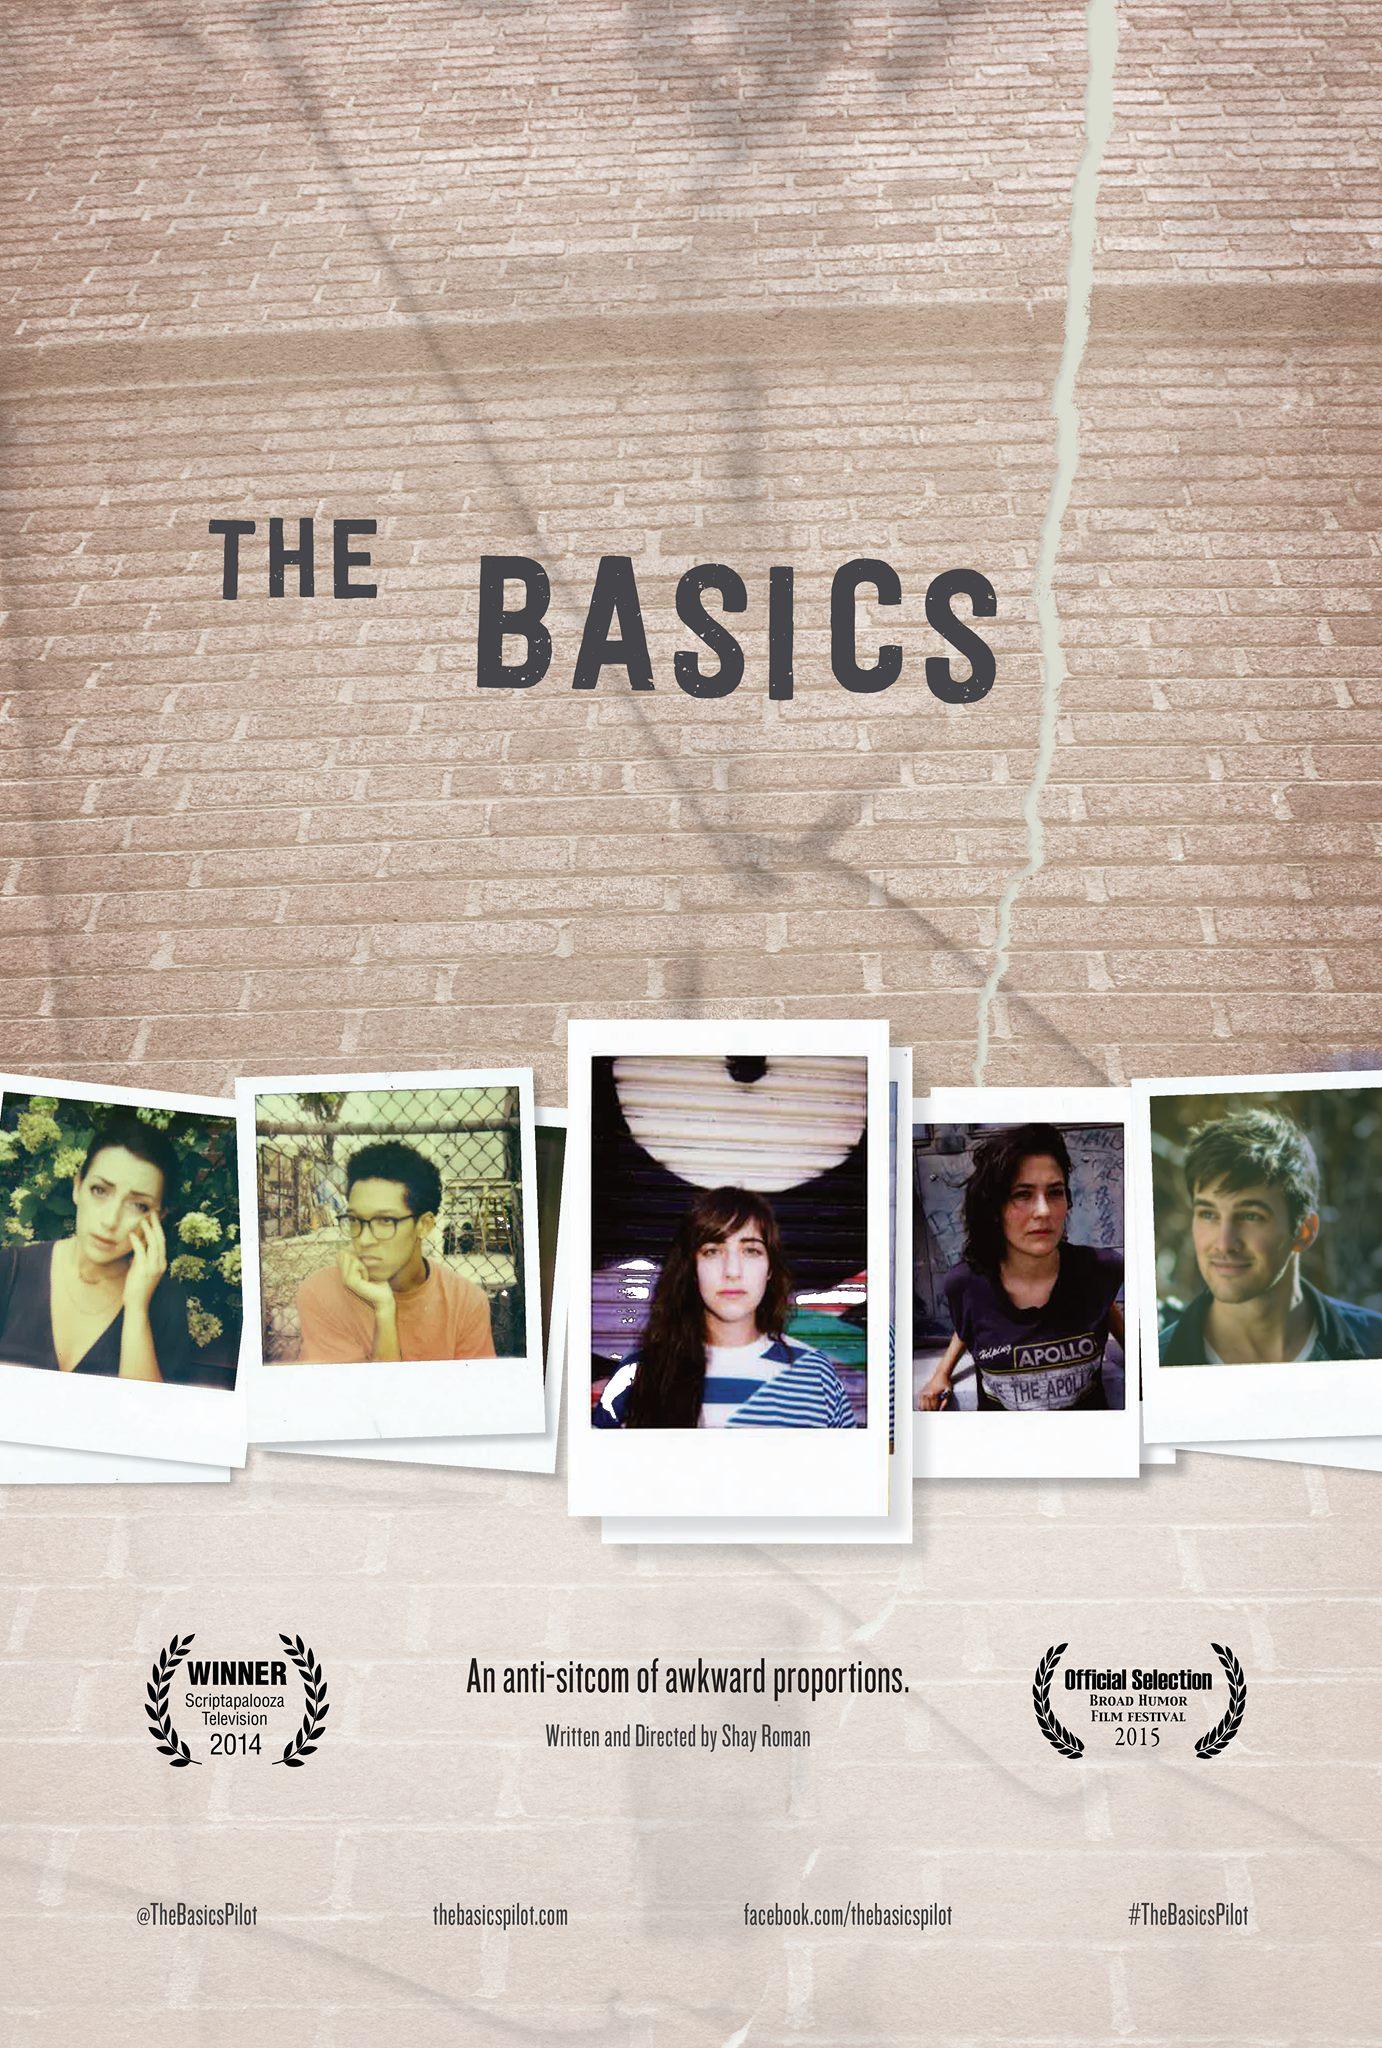 The Basics (Pilot) - An anti-sitcom of awkward proportions.